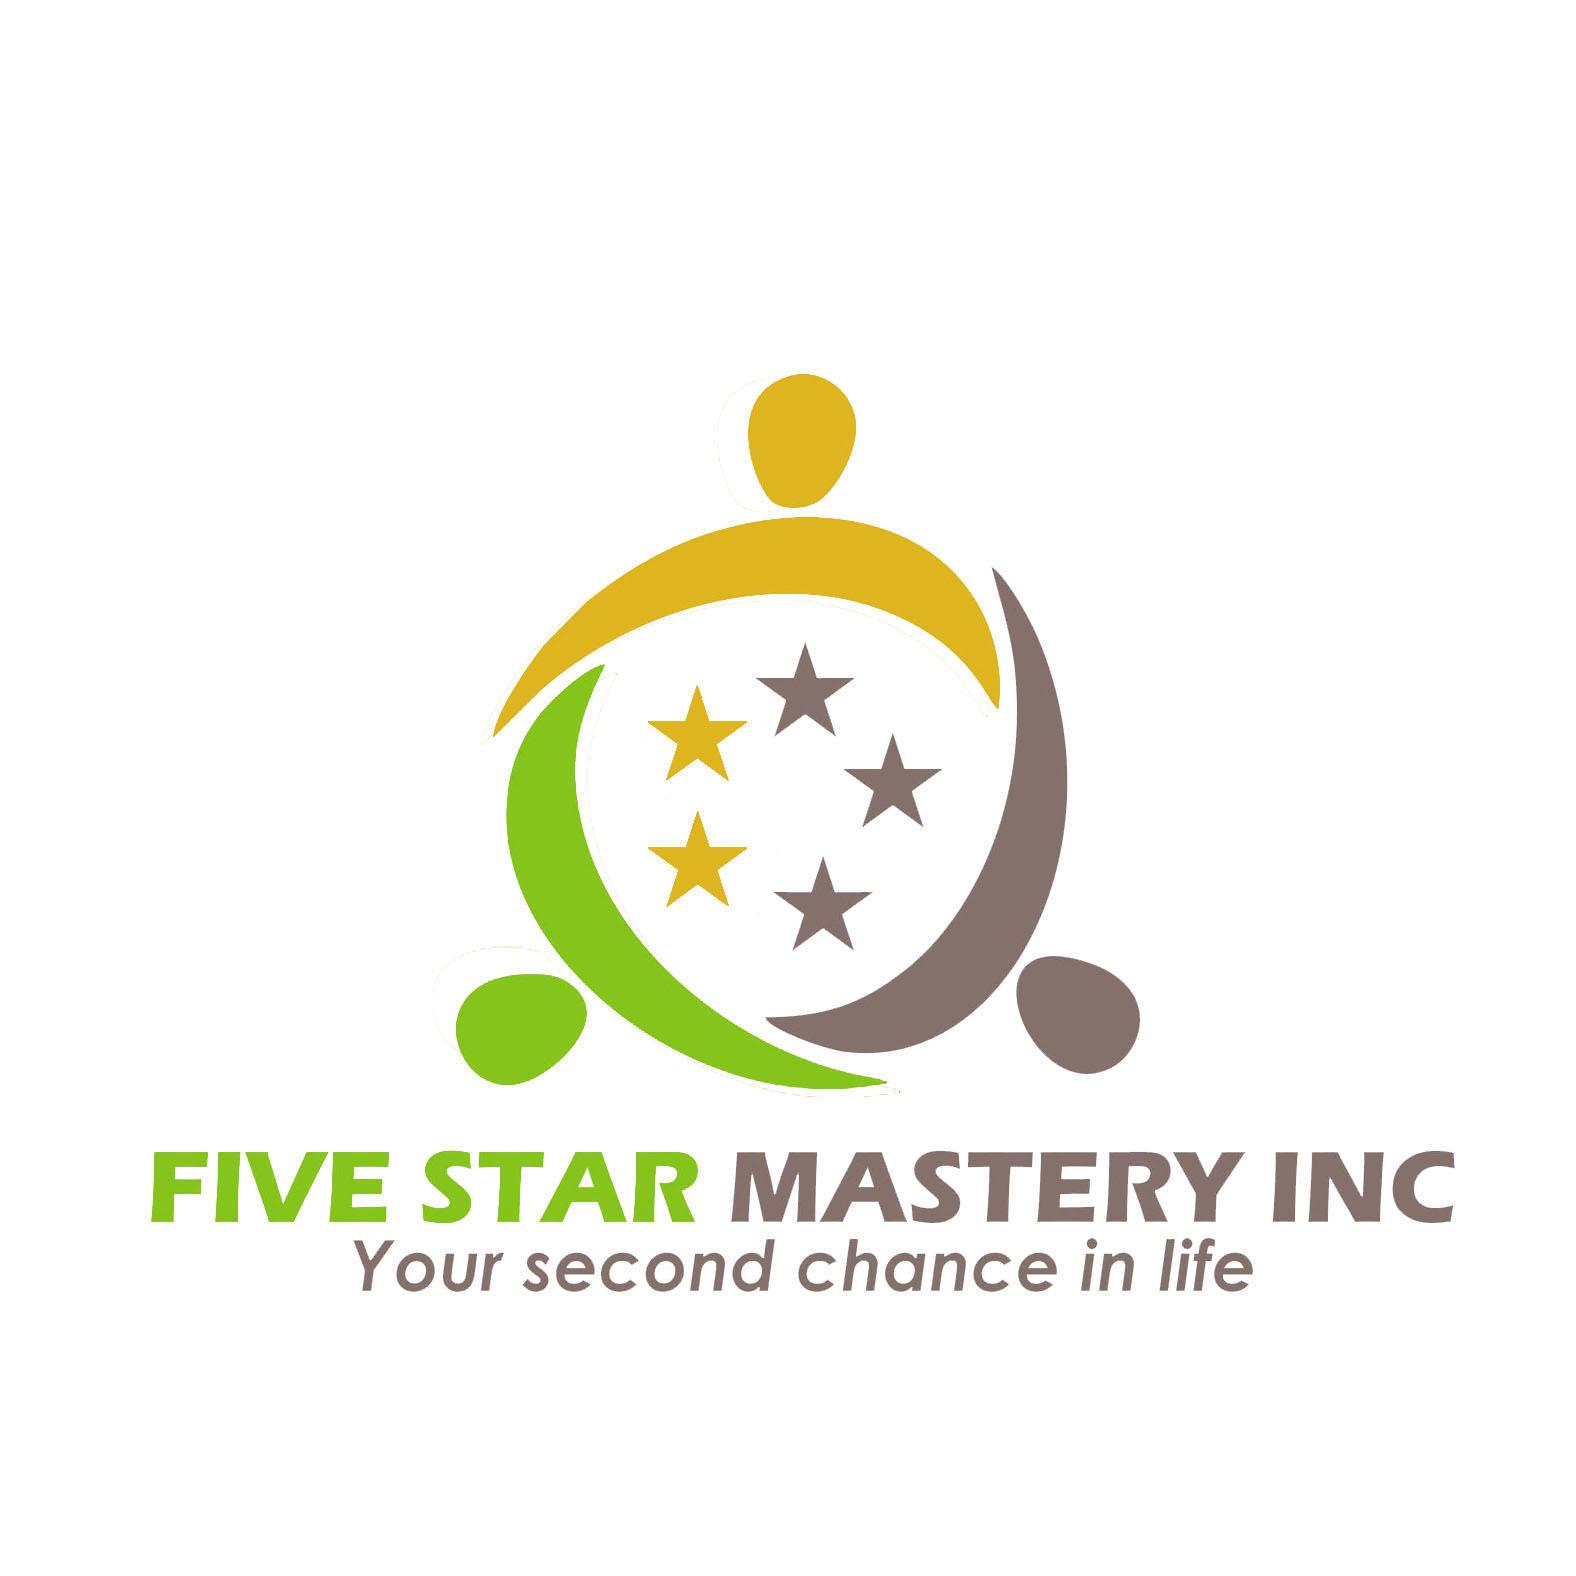 Five Star Mastery INC - Hollywood, FL 33020 - (754)703-6363 | ShowMeLocal.com